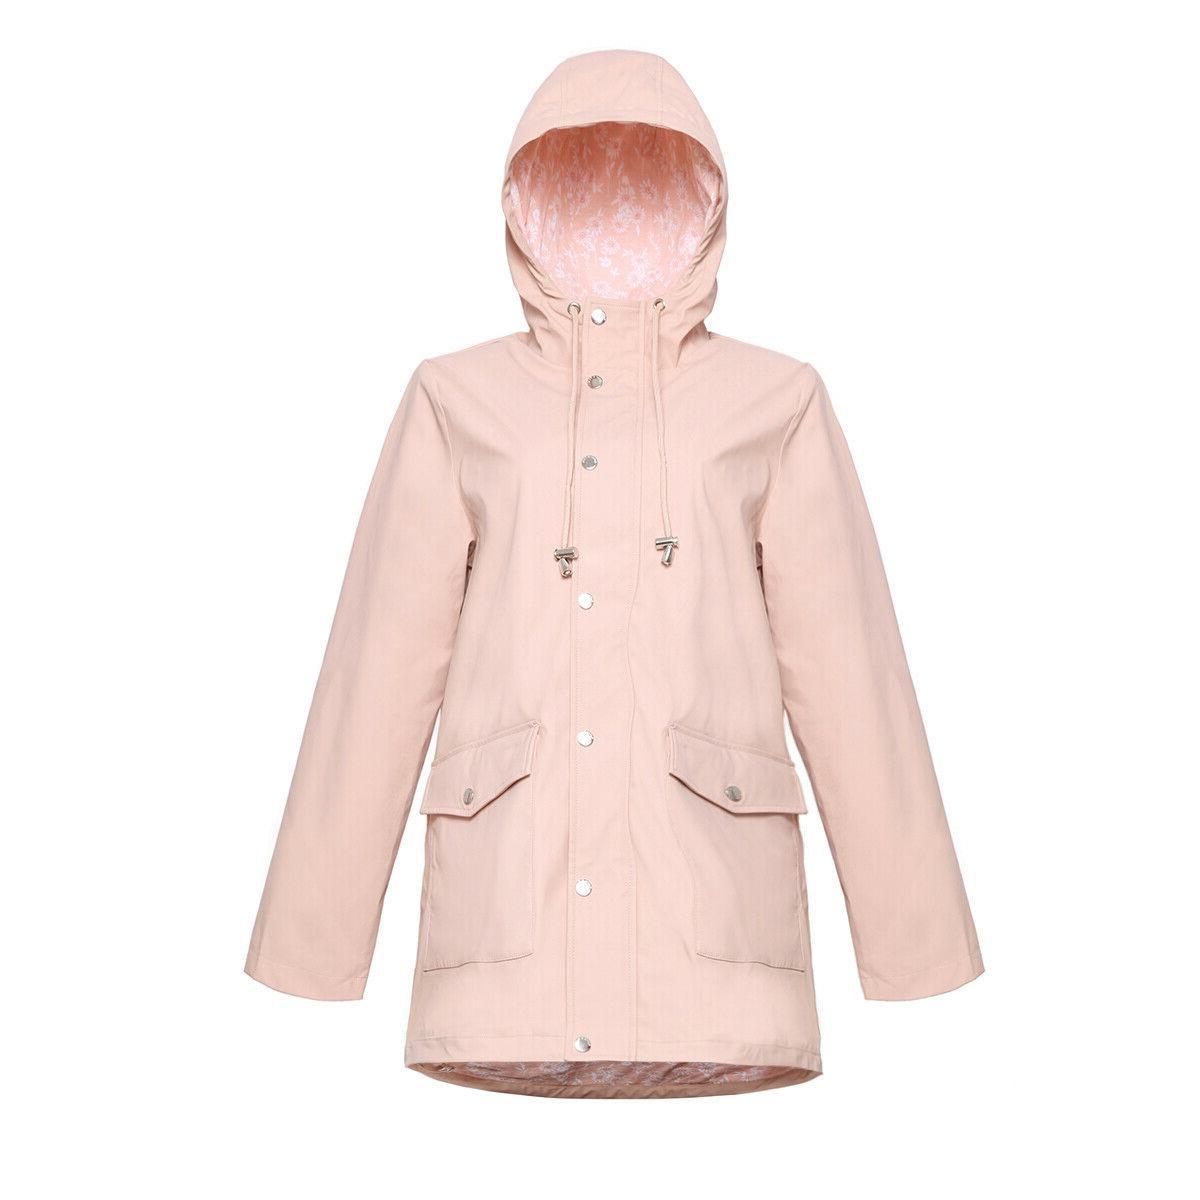 Women's Casual Rain Jacket Windbreaker Raincoat Parka